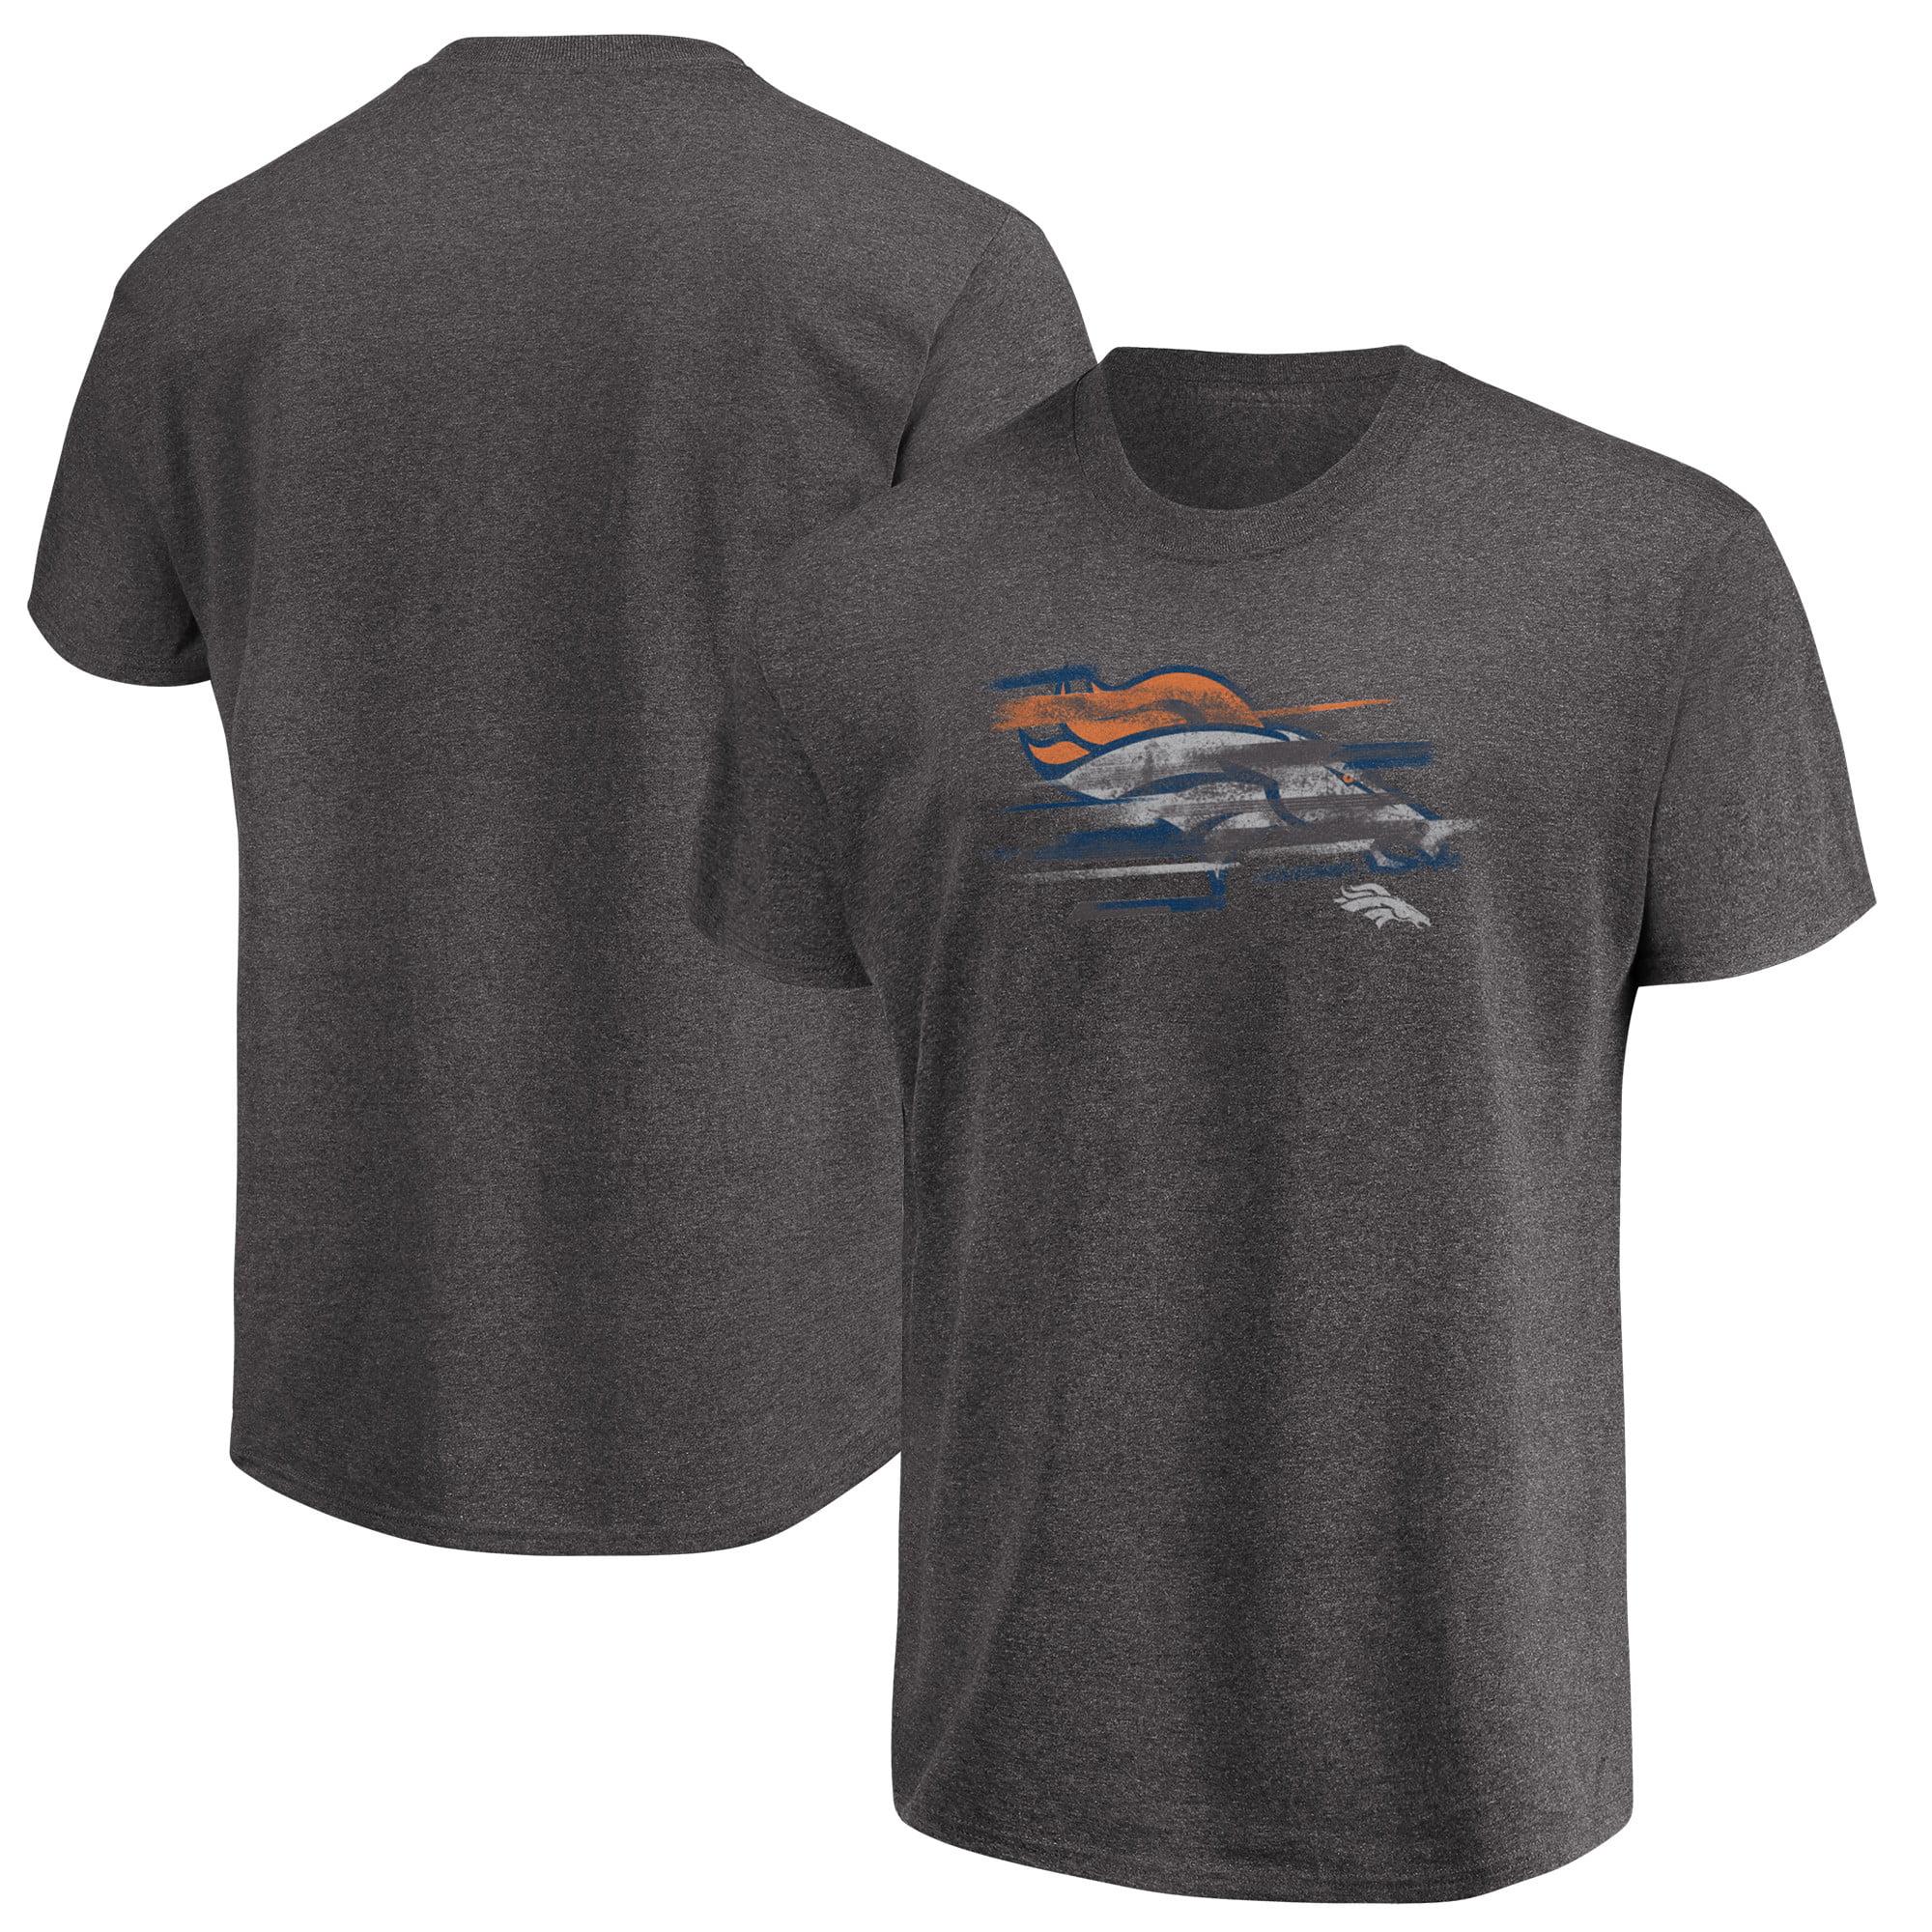 Denver Broncos Majestic Big & Tall Fierce Intensity T-Shirt - Heathered Charcoal